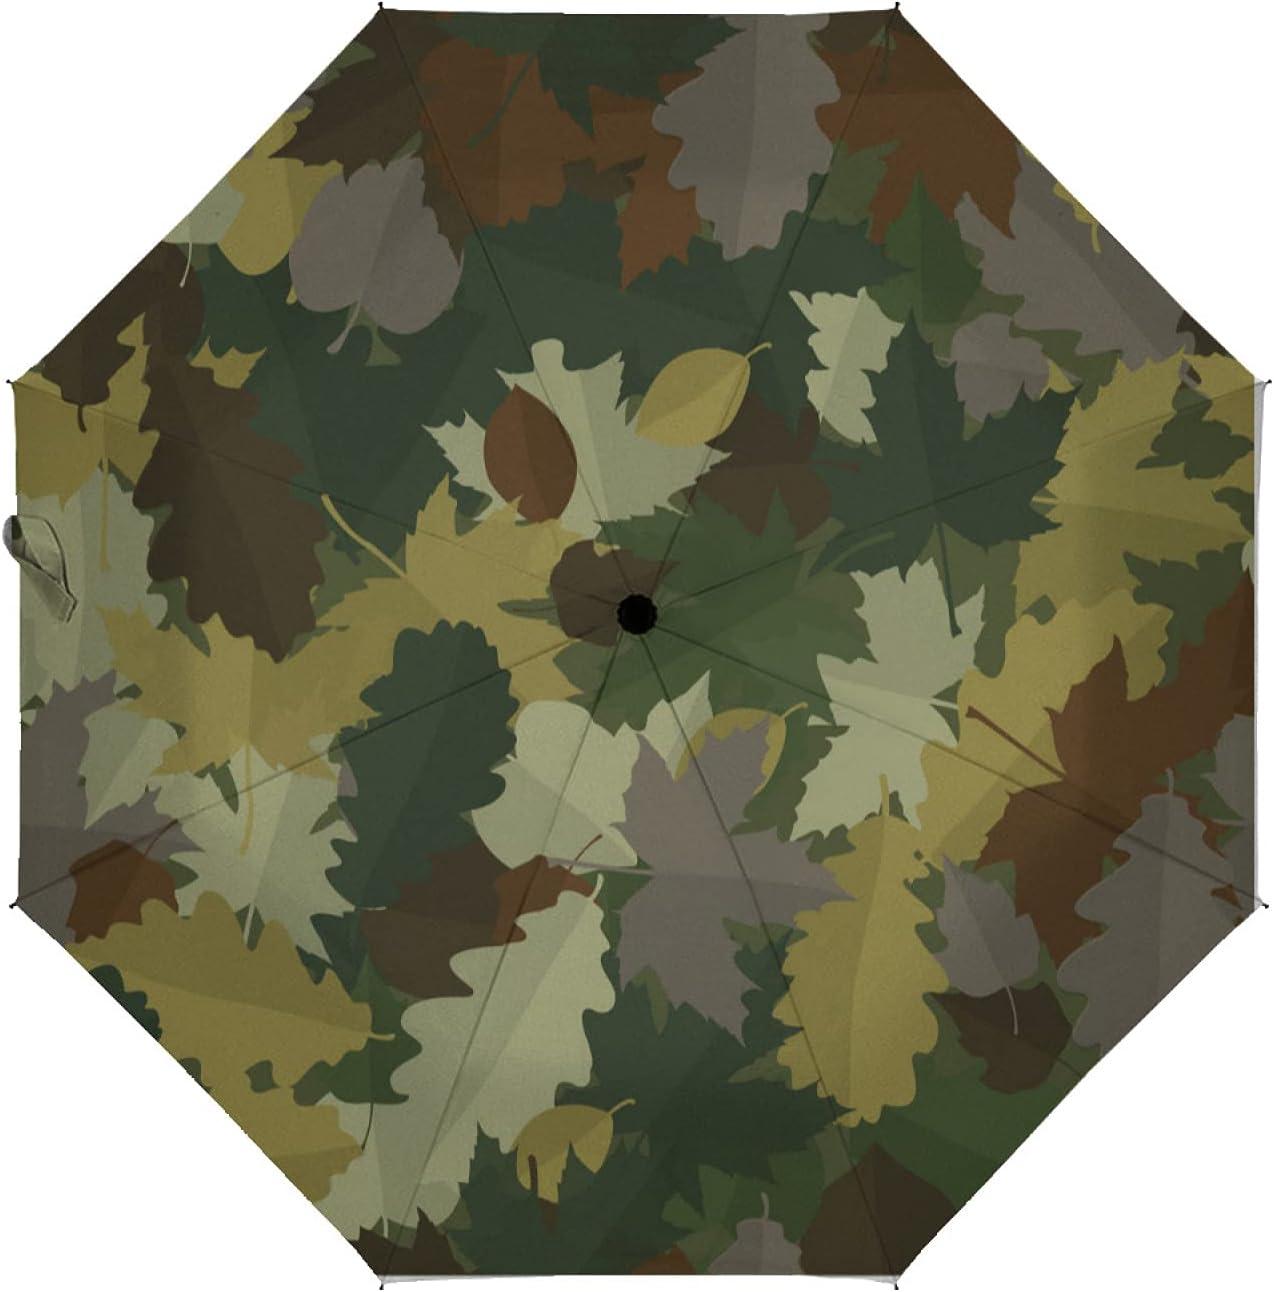 ZXZNC Compact Umbrella Woodland List price Camouflage With Autumn Le Fallen Cheap bargain